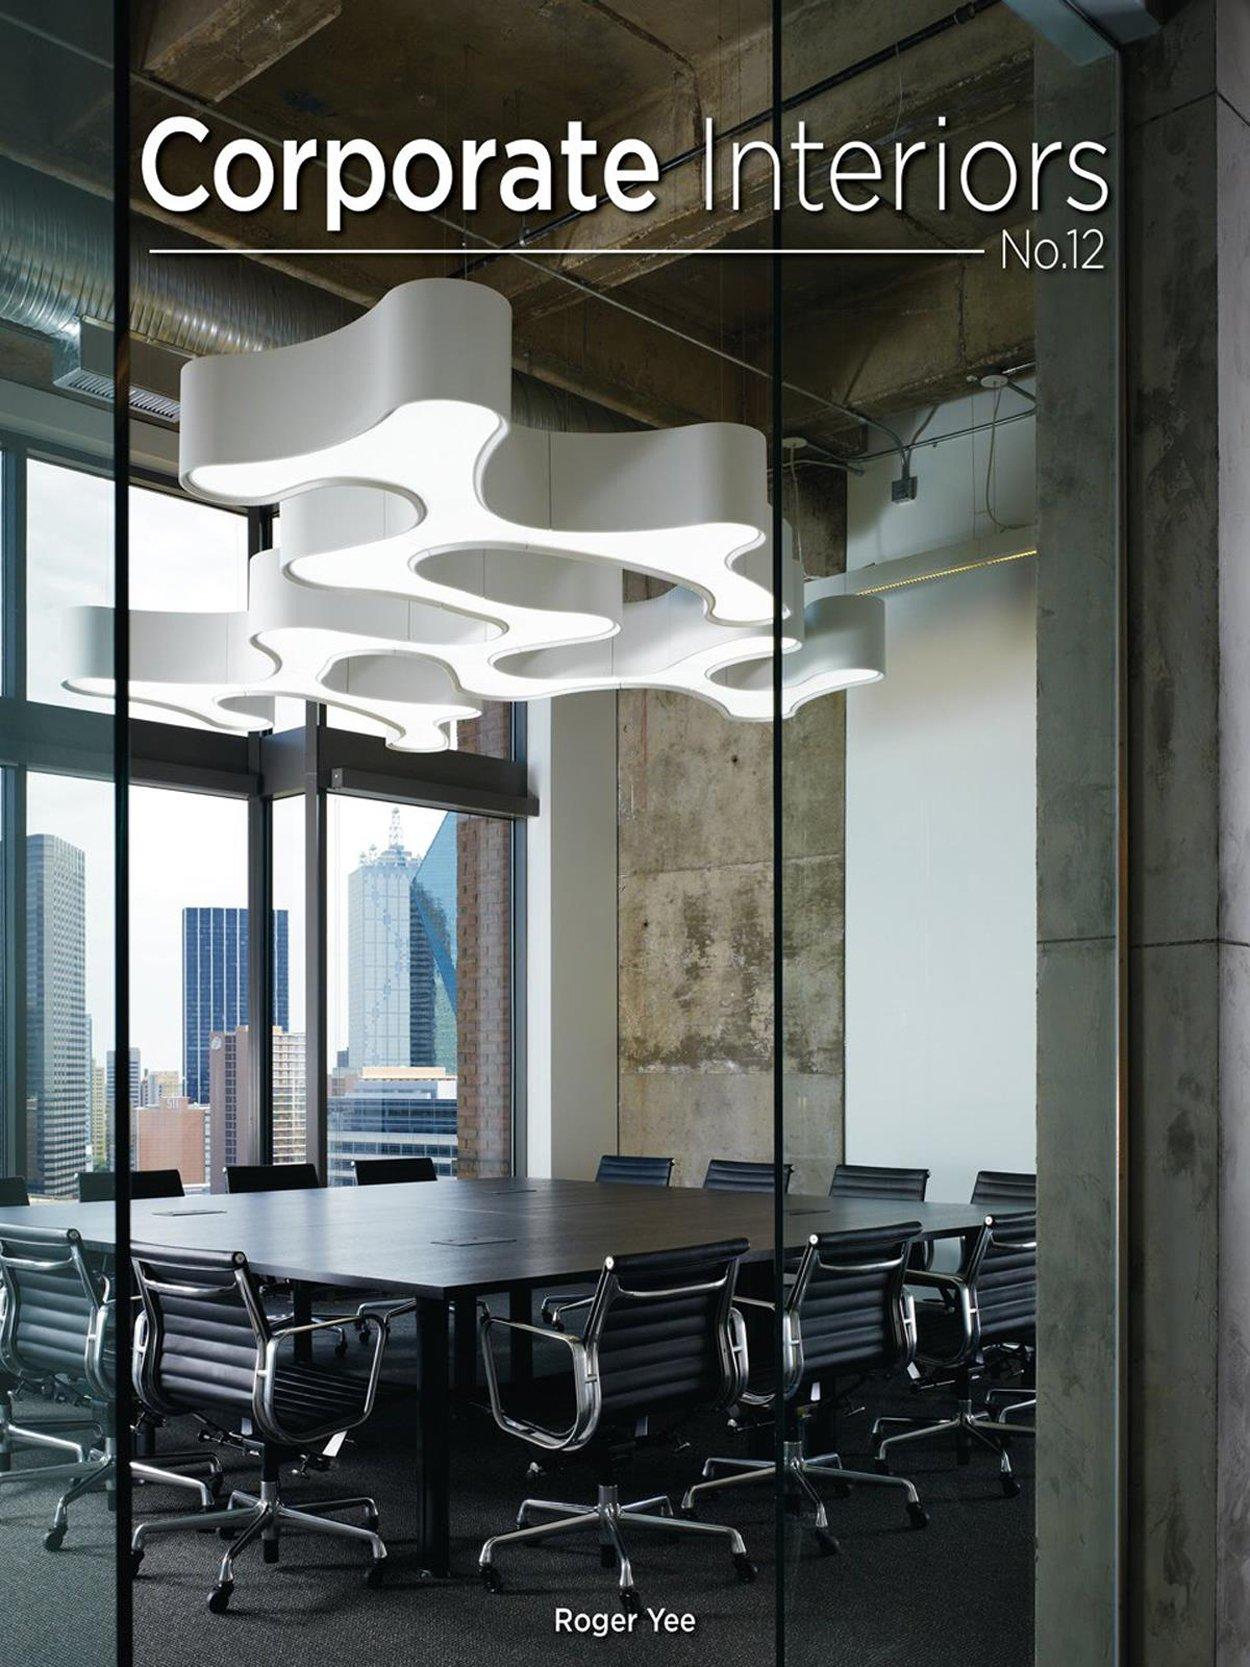 Download Corporate Interiors No. 12 PDF